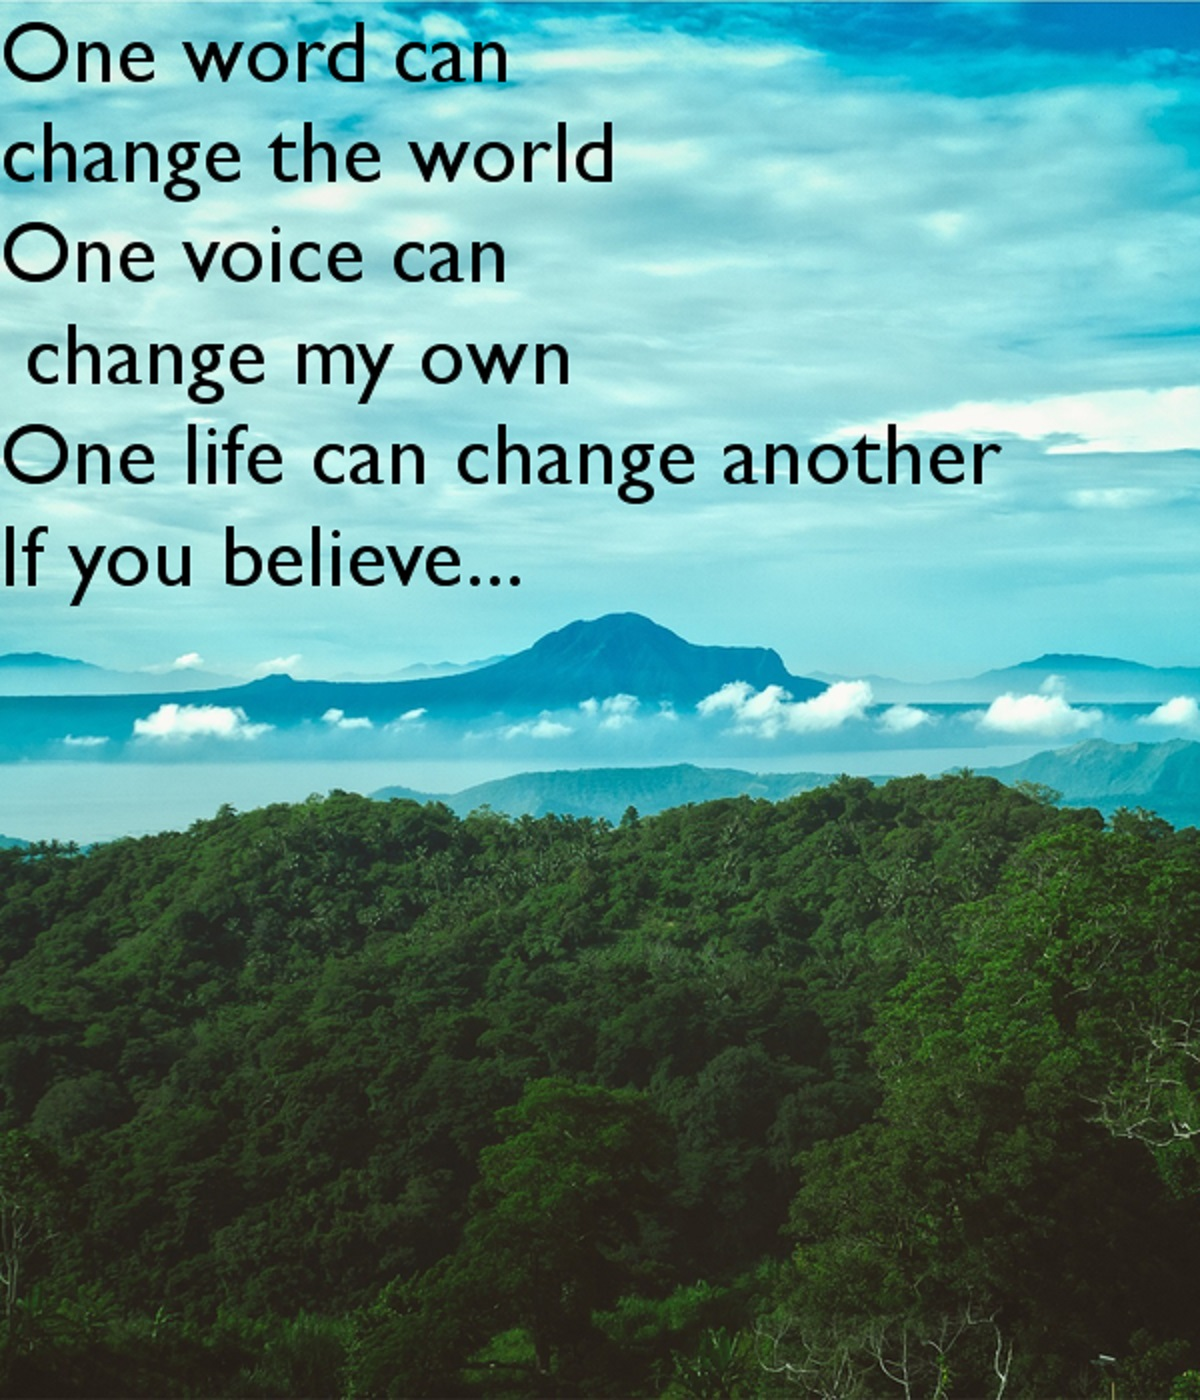 https://i1.wp.com/shivashaktibhava.files.wordpress.com/2018/04/one-word-can-change-the-world-one-voice-can-change-my-own-one-life-can-change-another-if-you-believe.jpg?ssl=1&w=450